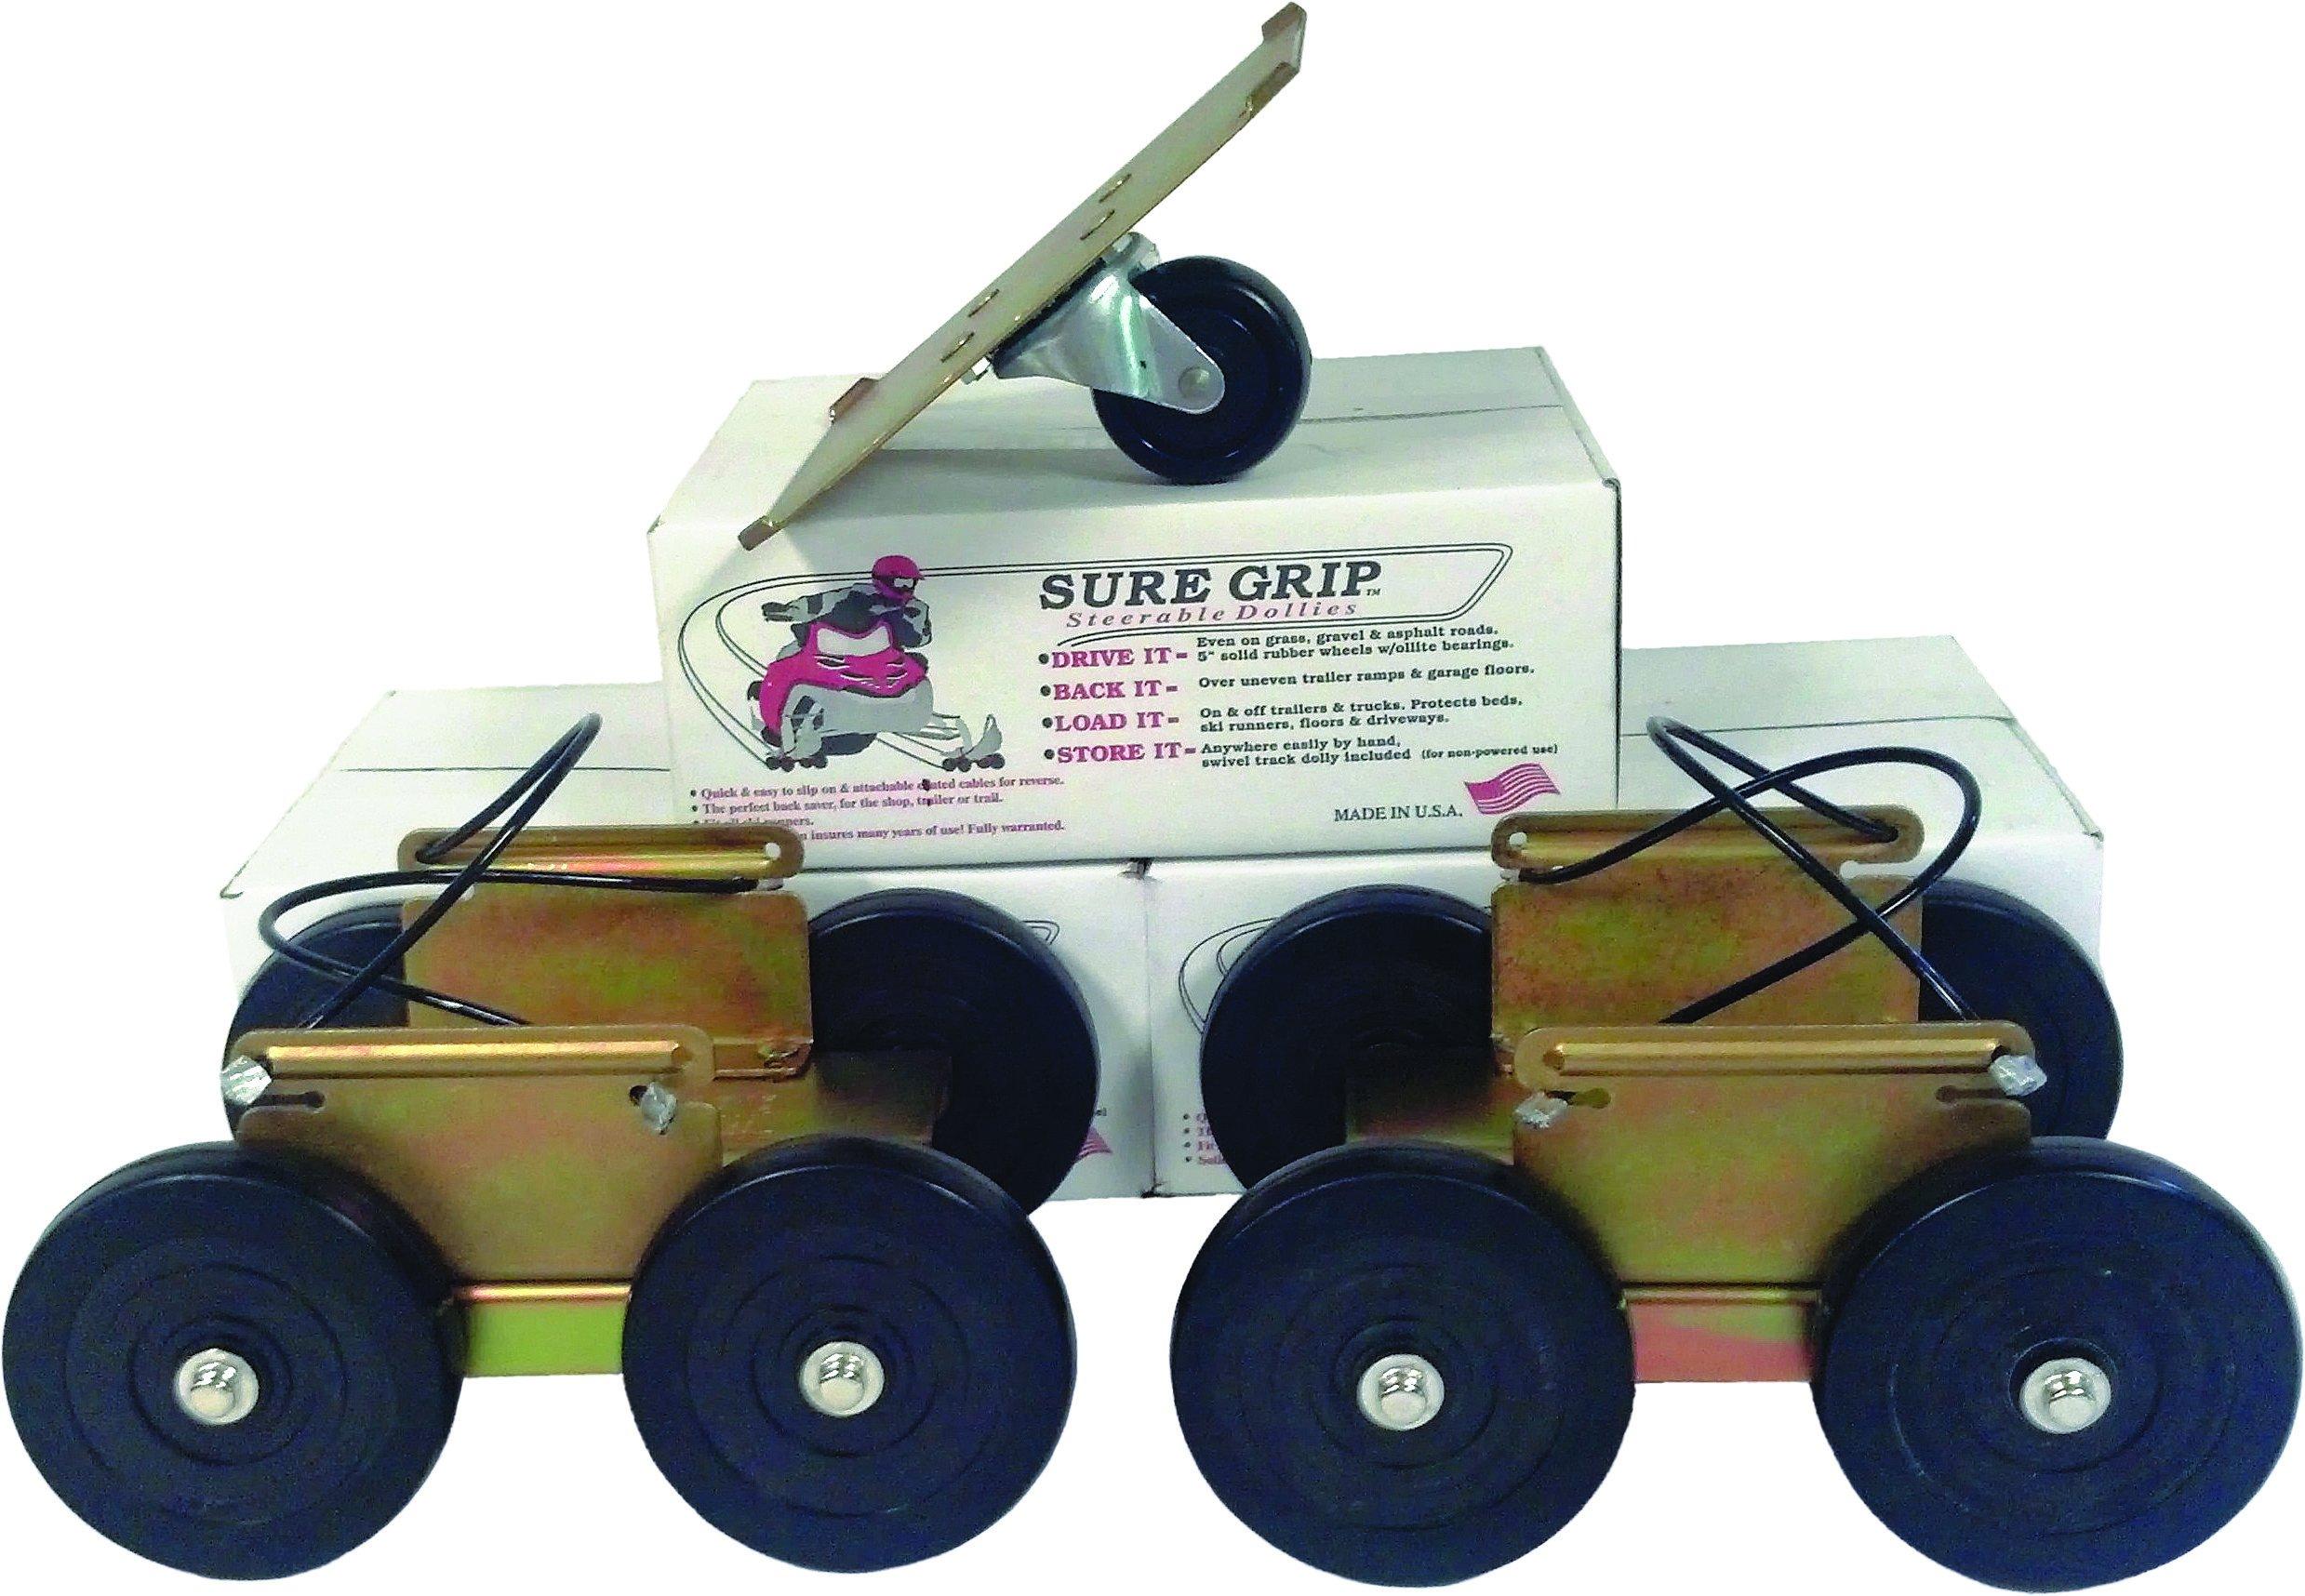 Sure Grip Dollies Drivable Dolly - 3 Piece Long Set PS-6112